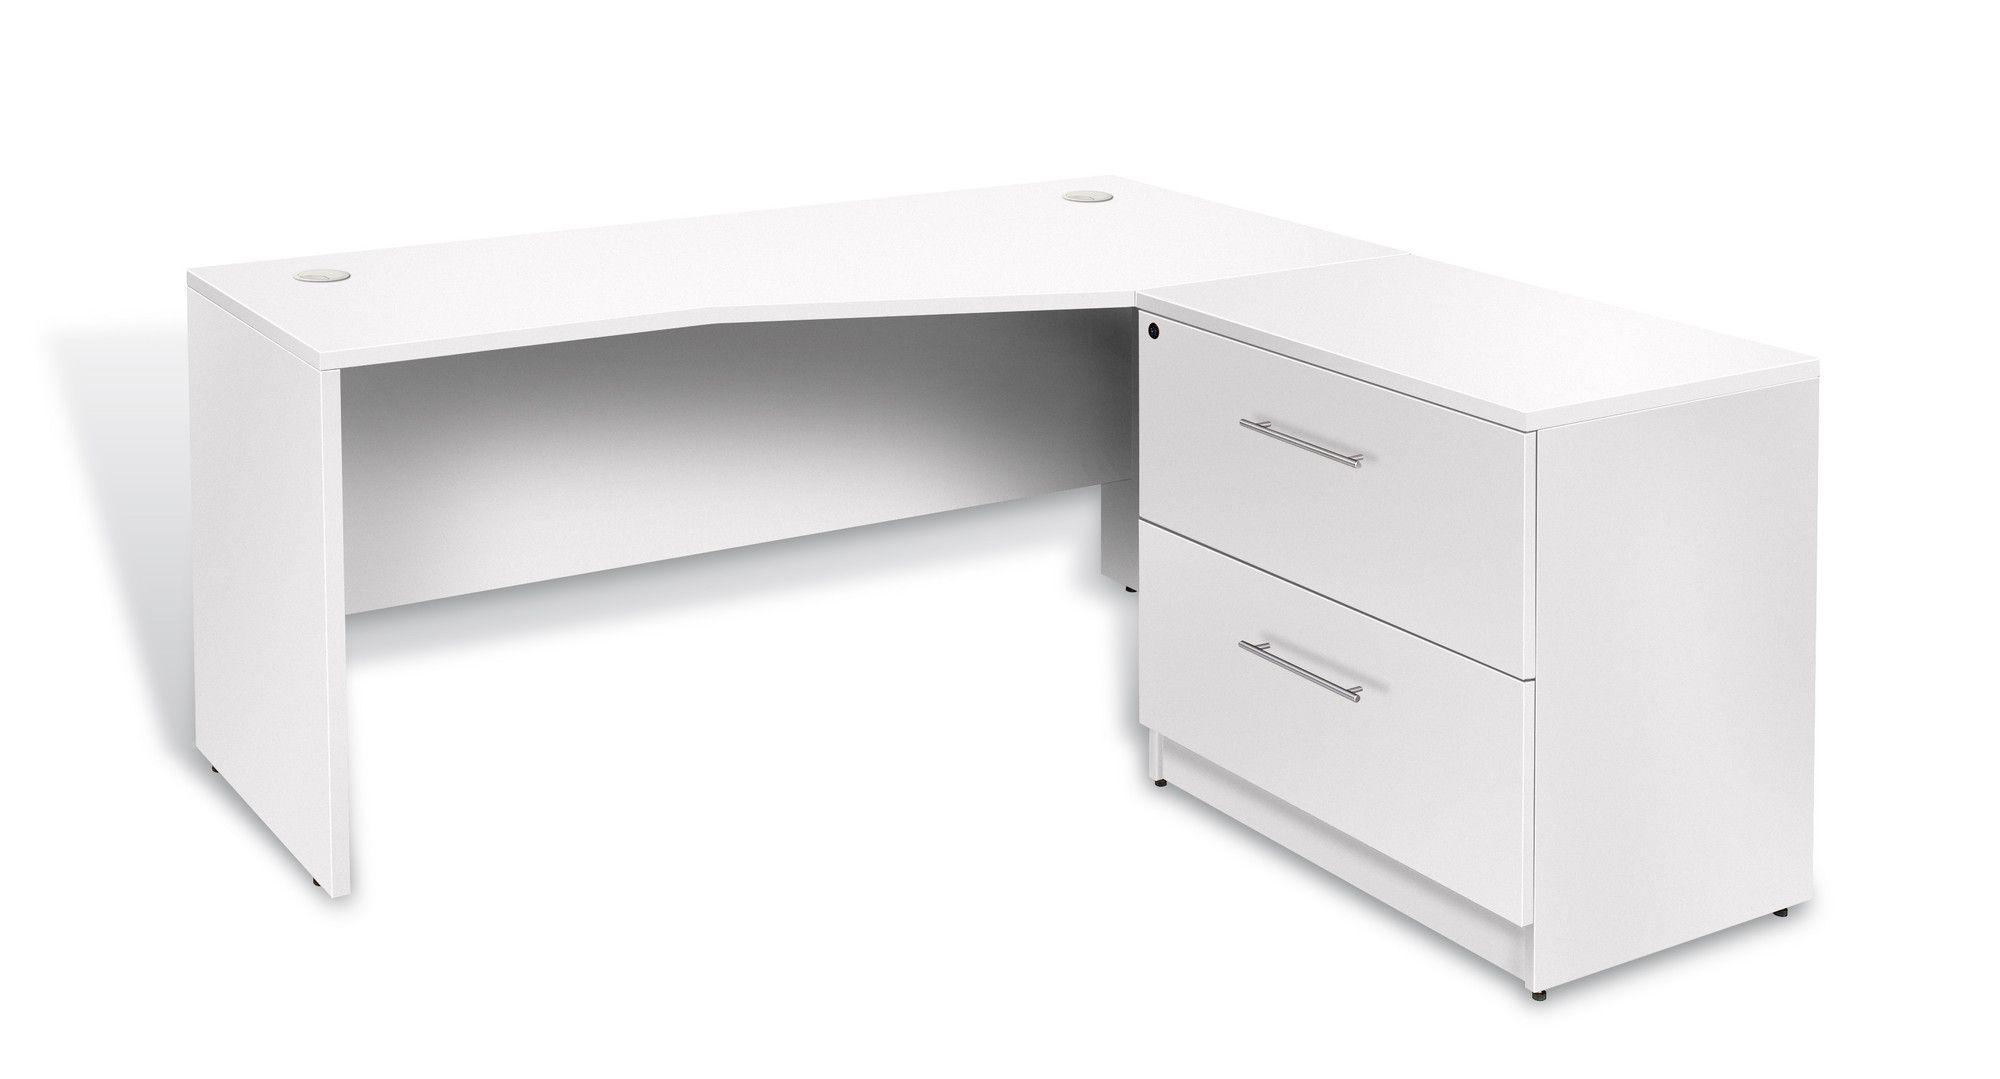 Pro X Corner L Shape Computer Desk With Filing Cabinet File Cabinet Desk Desk Best Desk Corner desk with filing cabinets